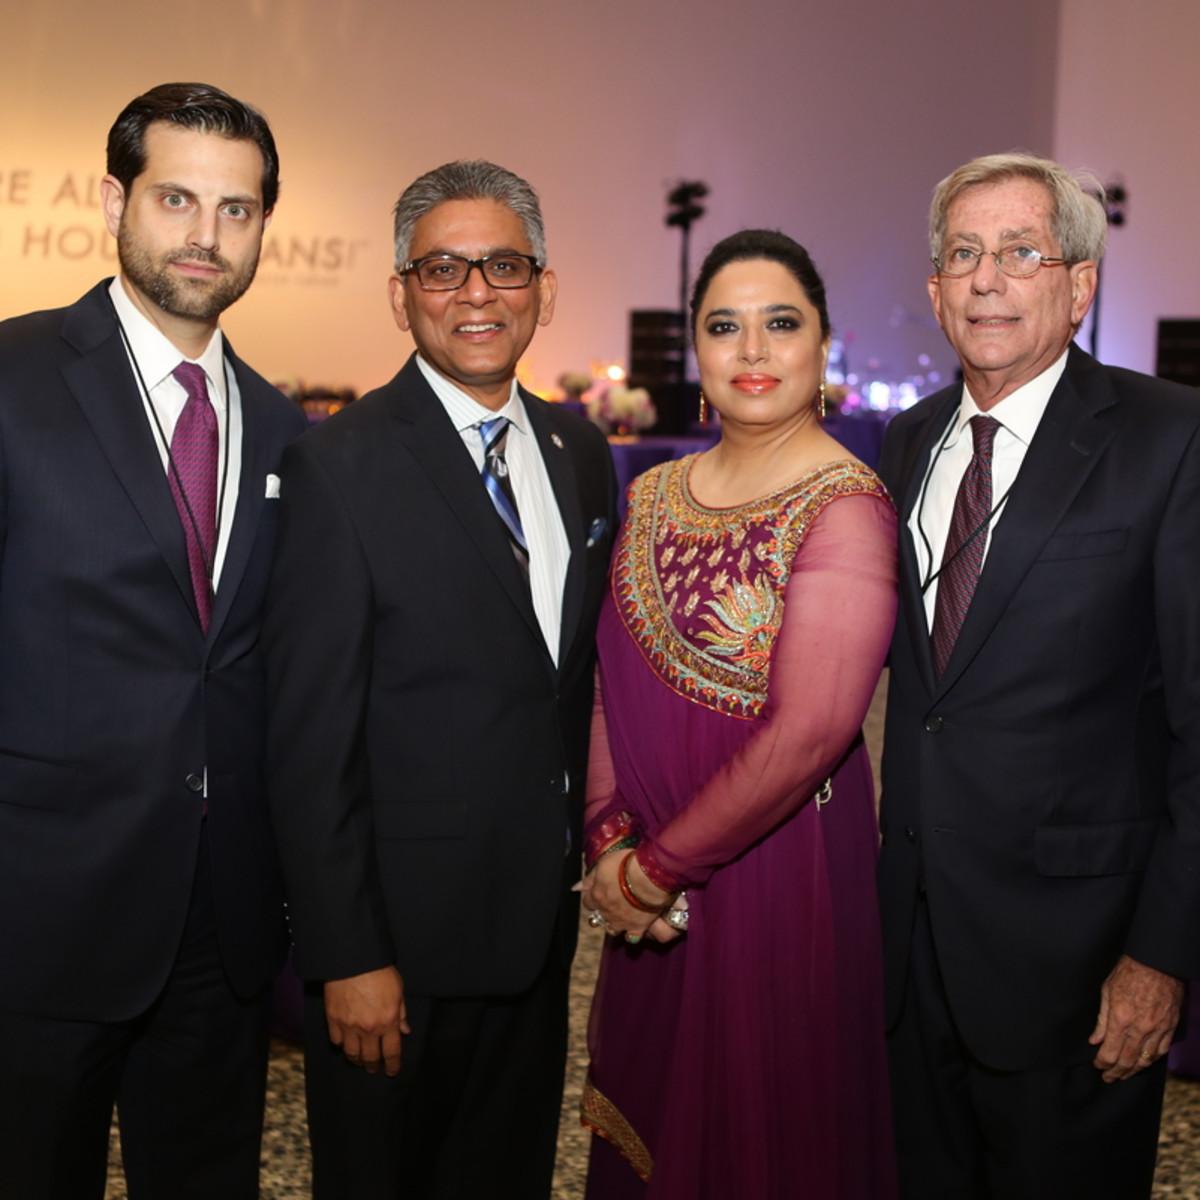 News, Mayor Sylvester Turner Inauguration, Jan. 2016, MFAH, Jonathan Zadok, Zaf Tahir, Yasmeen Tahir, Fed Zeidman